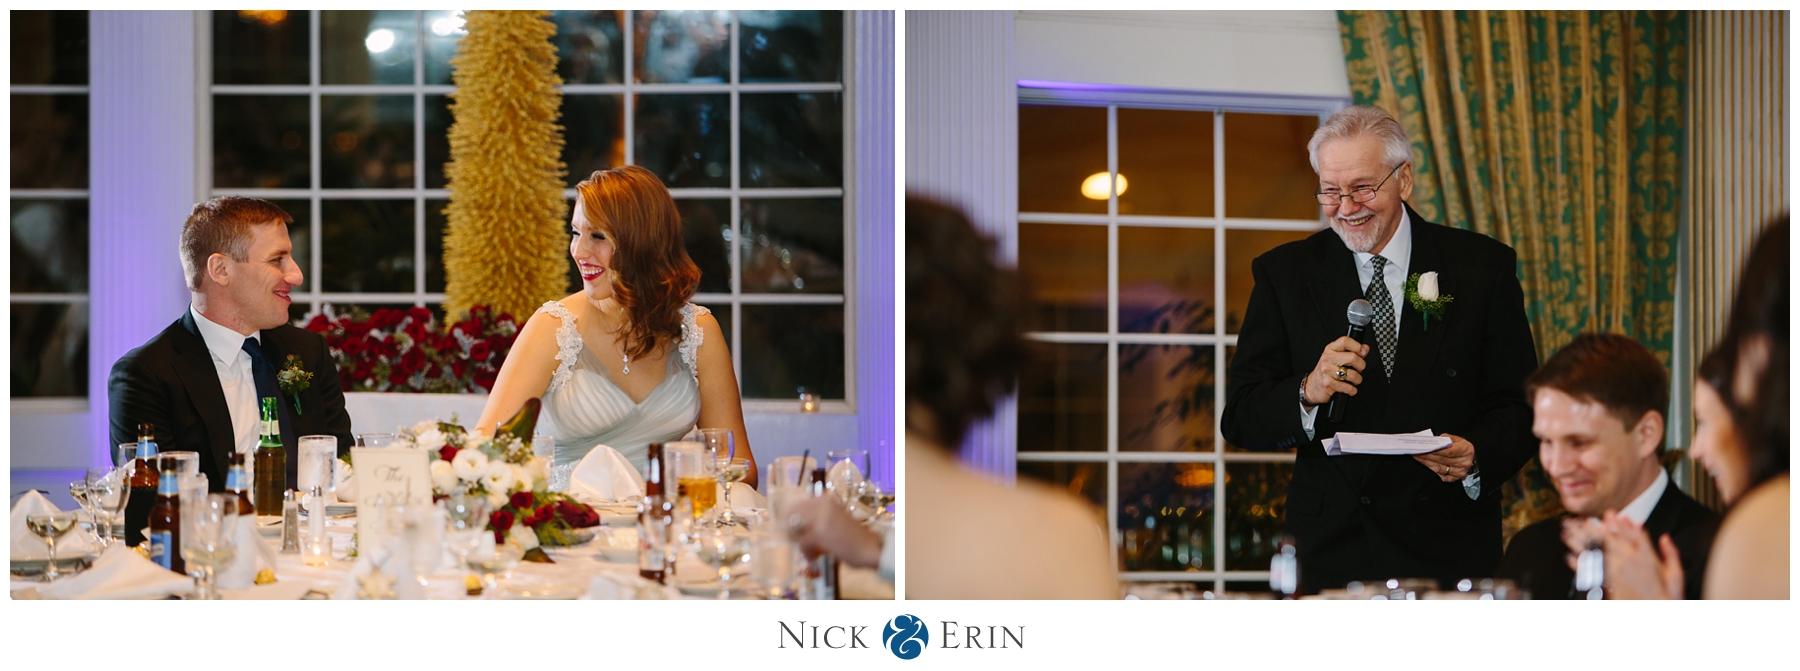 Donner_Photography_Mendenhall Inn Wedding_Blake & Kristina_0040